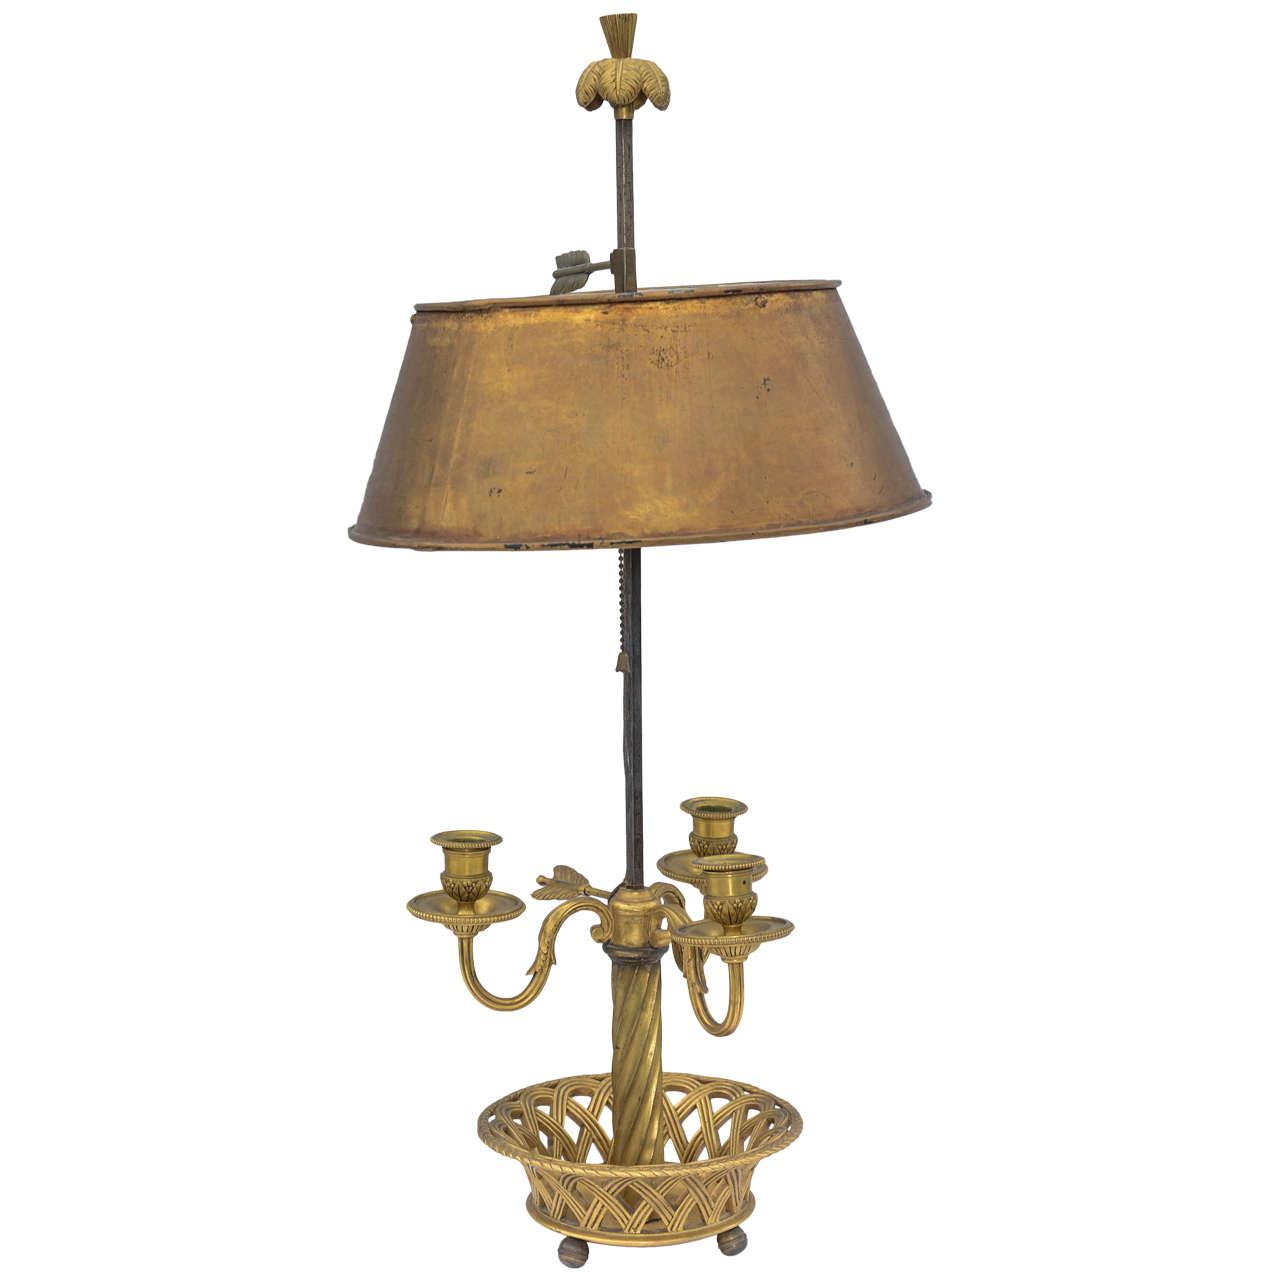 19th Century French Gilt Bronze Bouillotte Lamp